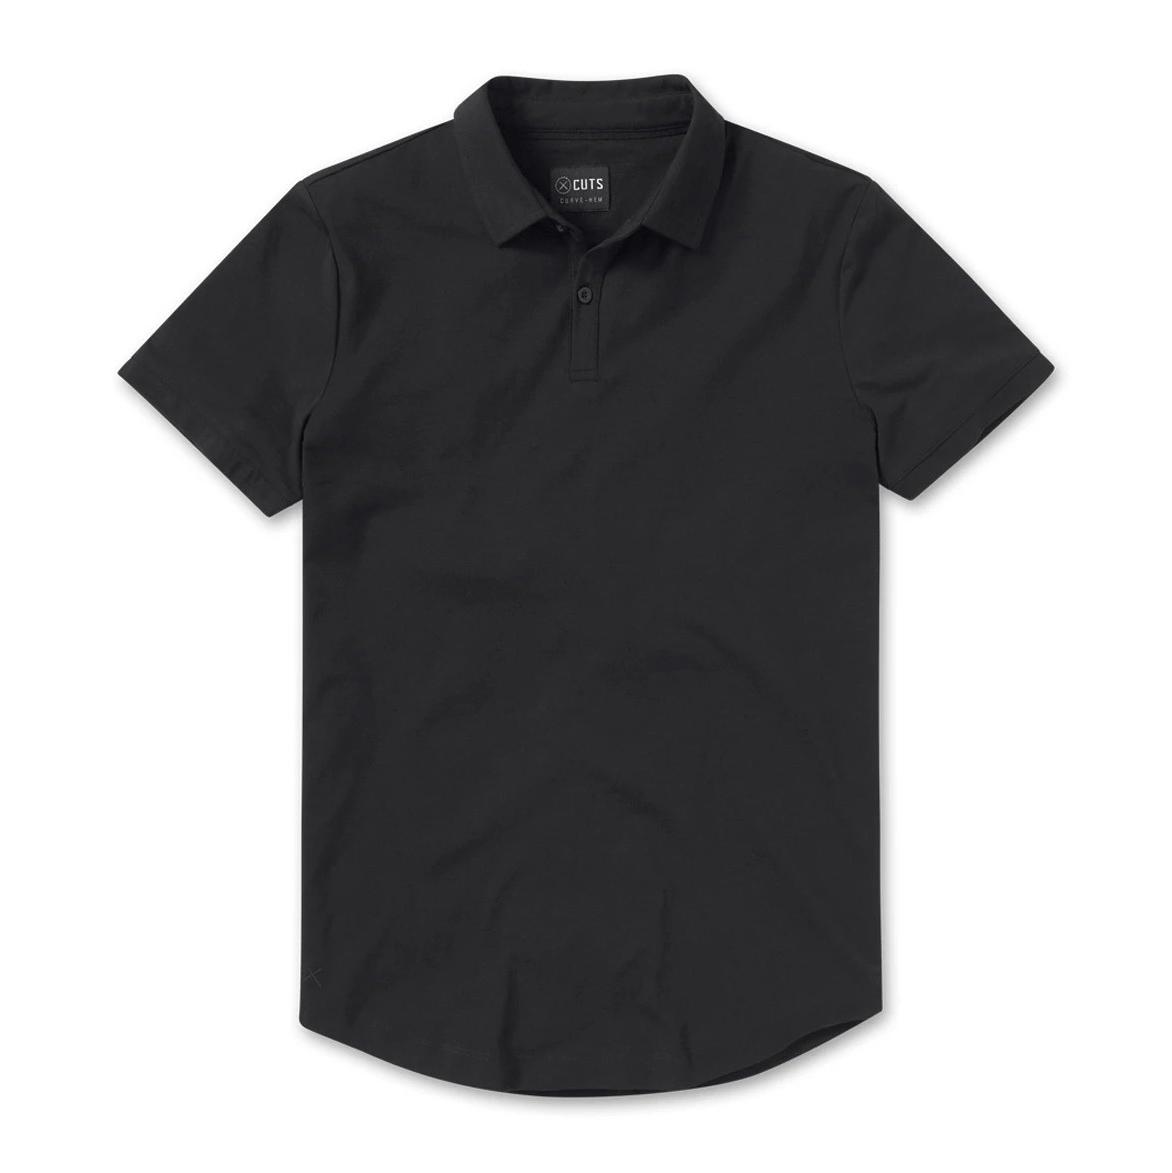 Cuts Clothing Polo Curve-Hem, best golf shirts for men